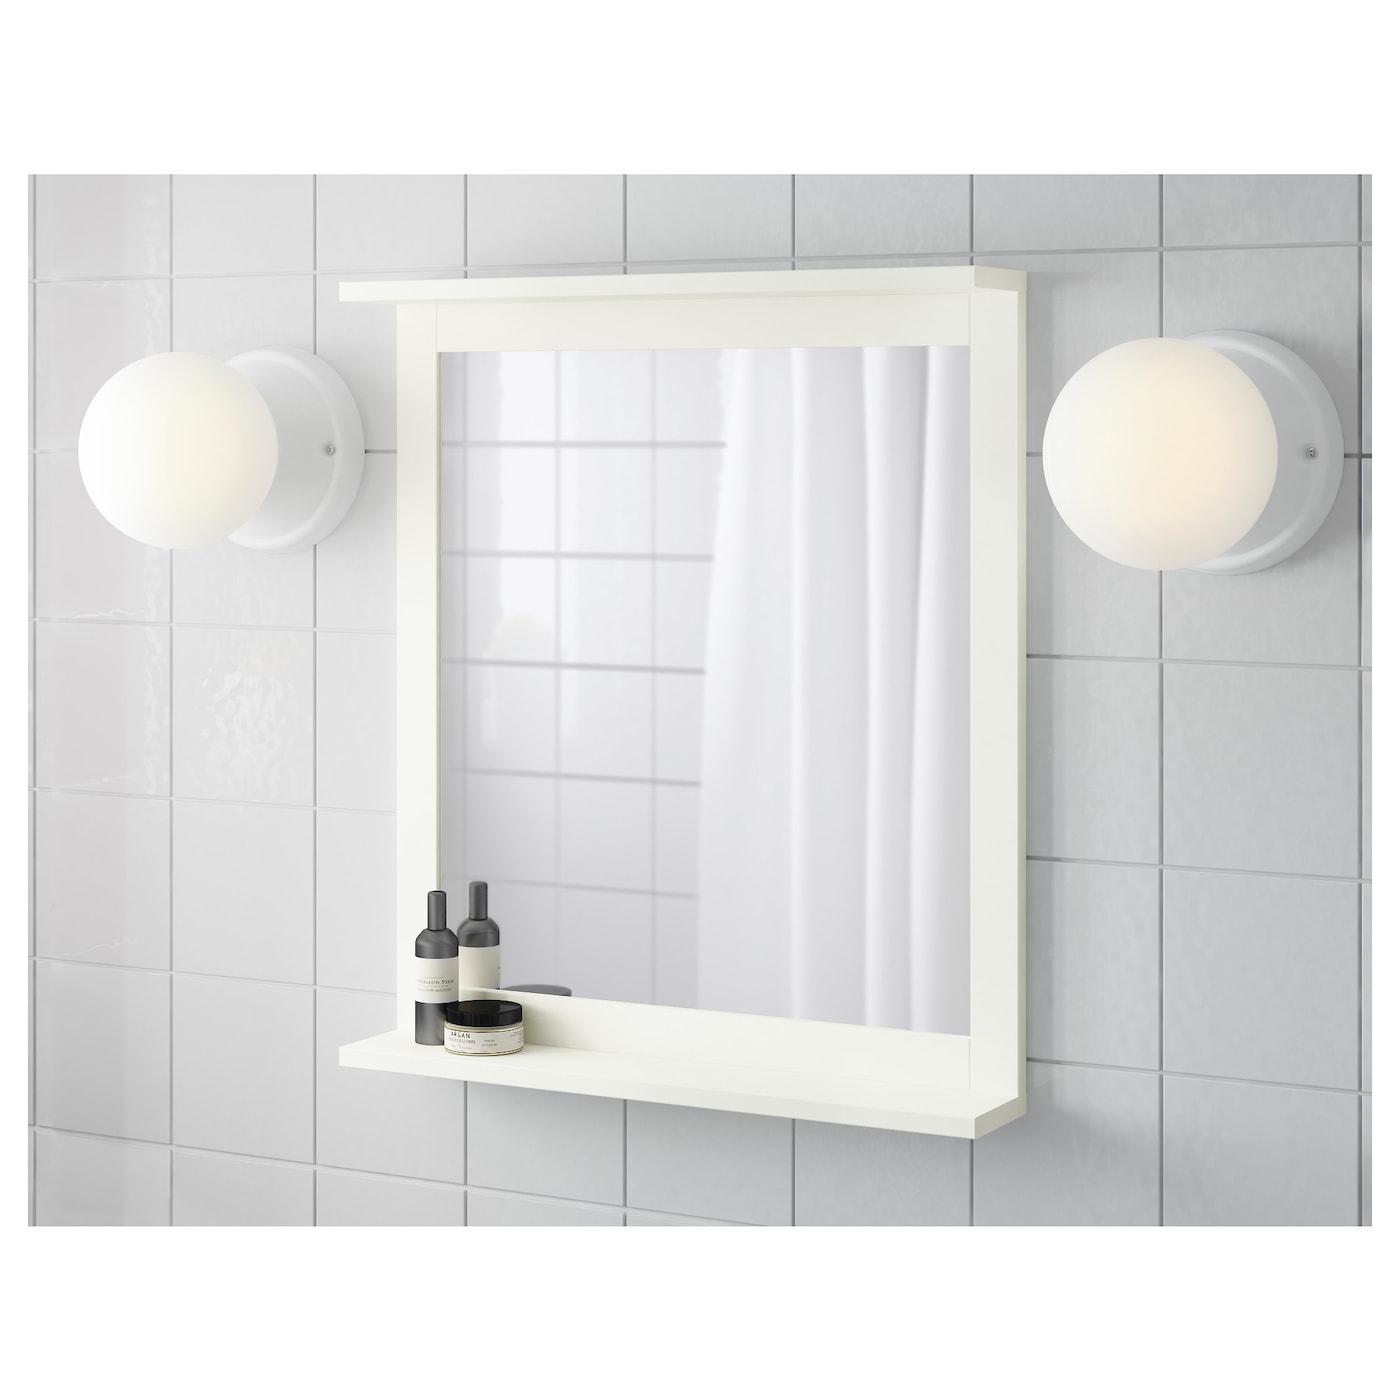 Silverån Mirror With Shelf White 22x25 1 8 Ikea